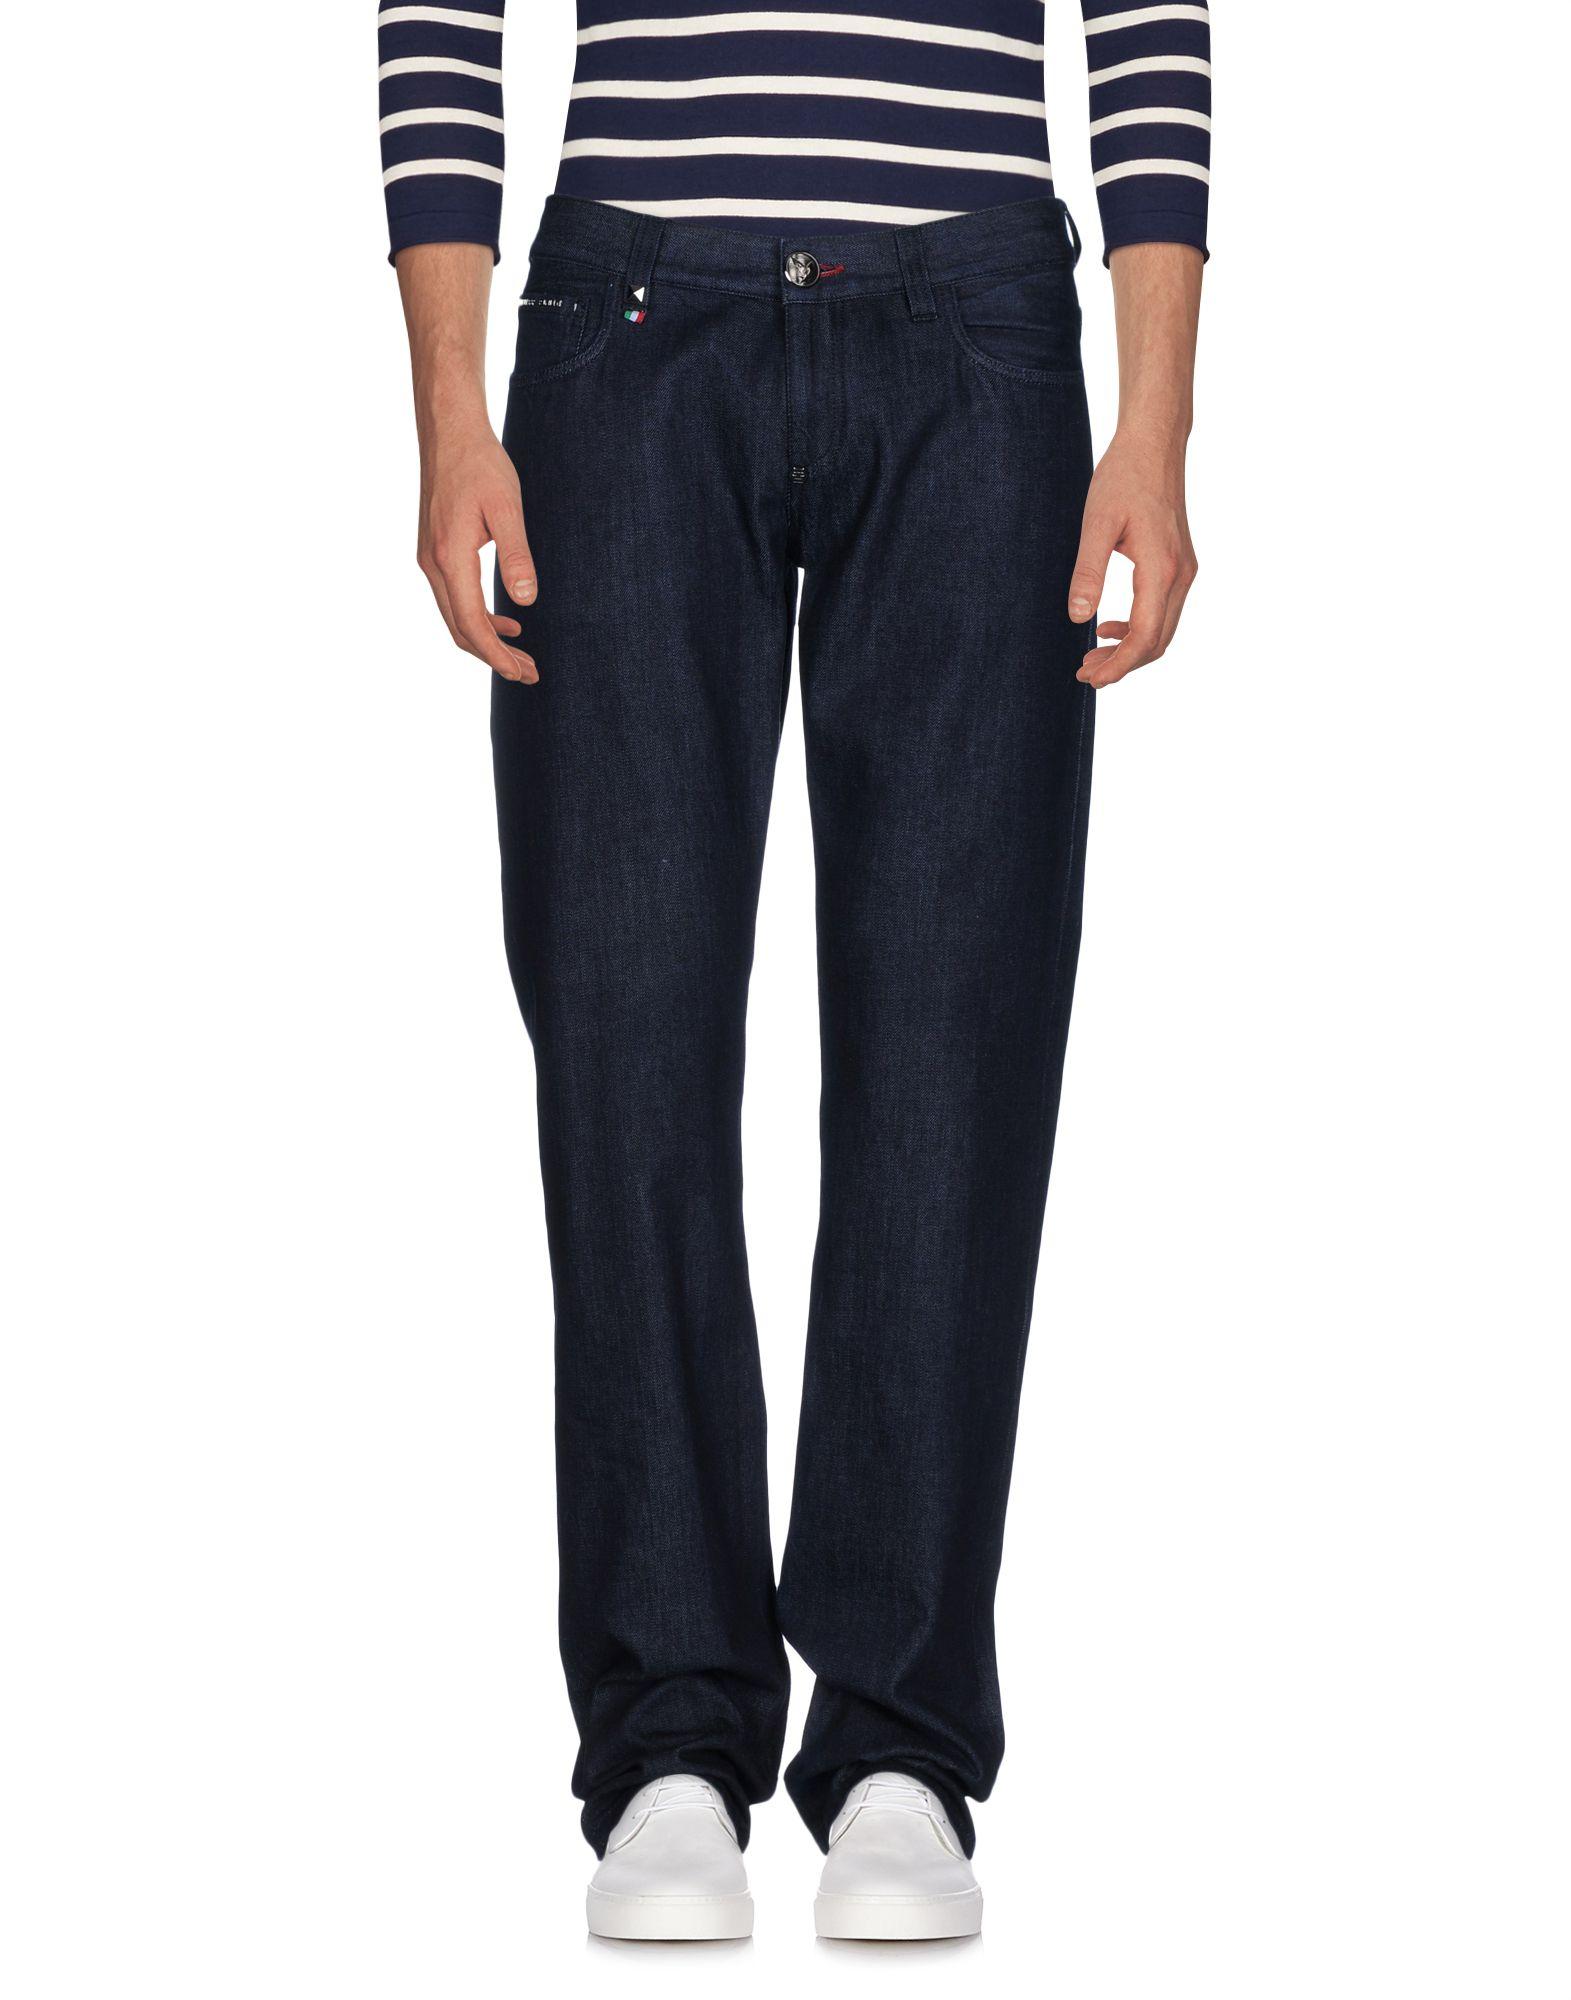 Pantaloni Jeans Acquista Plein Philipp Uomo su online qq8Pr